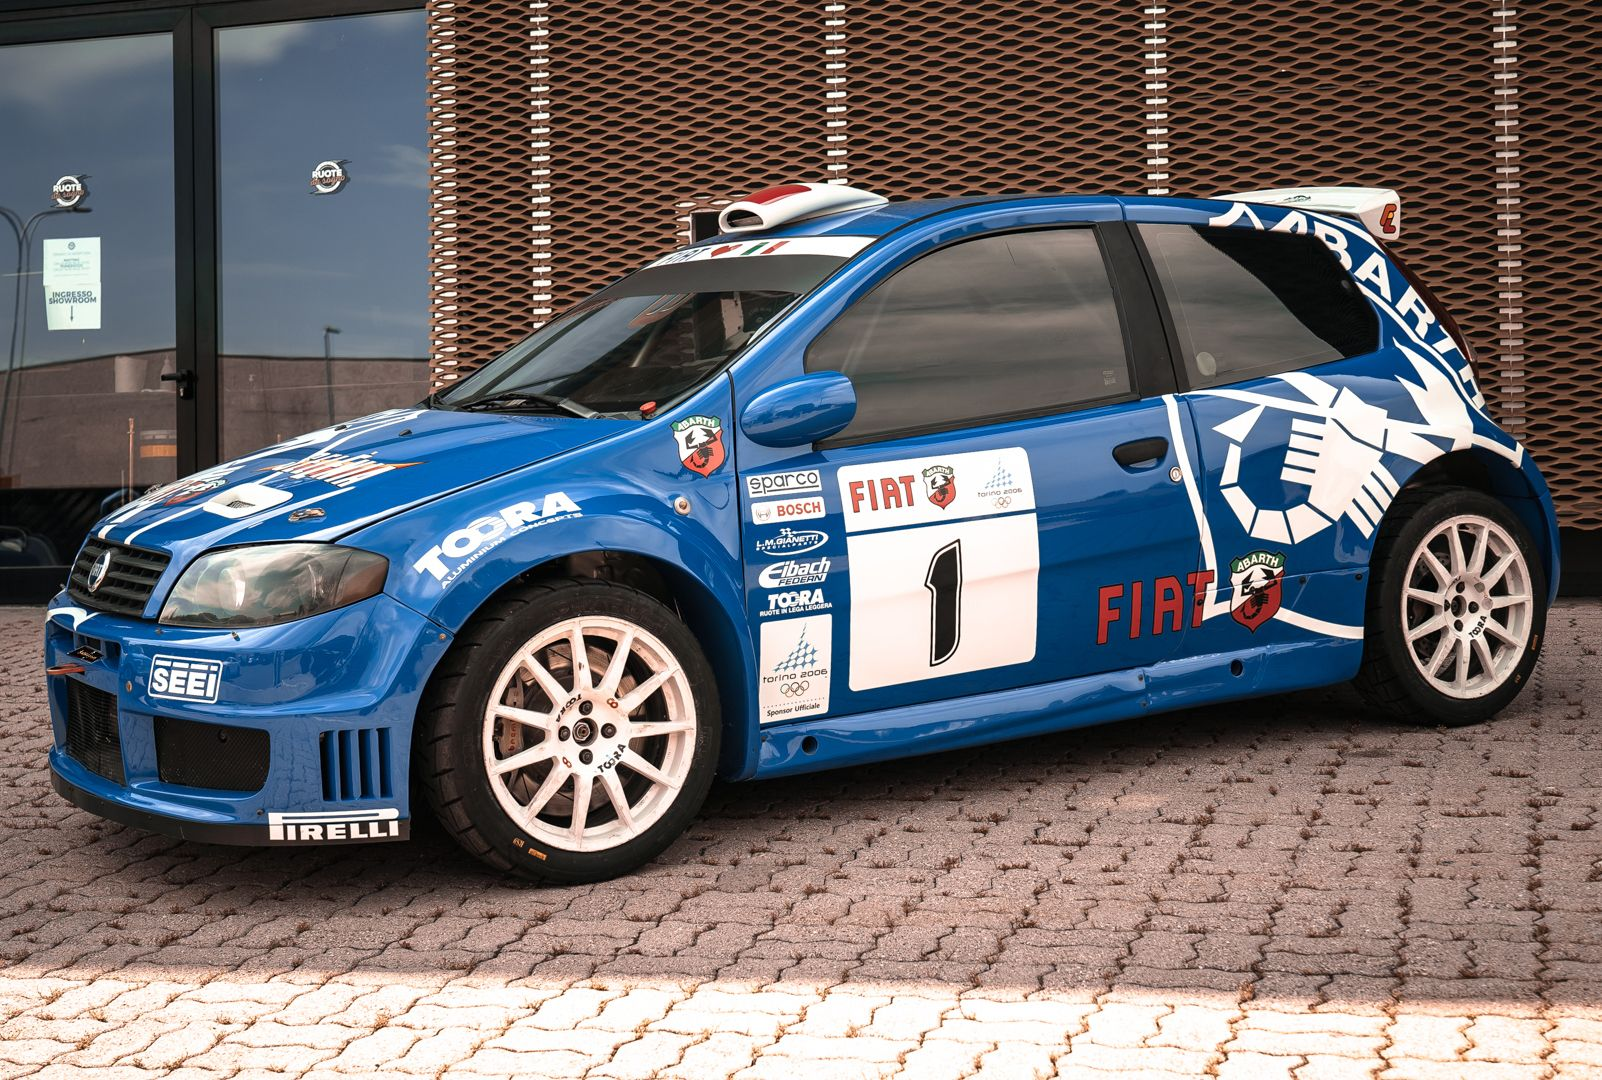 2004 Fiat Punto S1600 Rally 76541